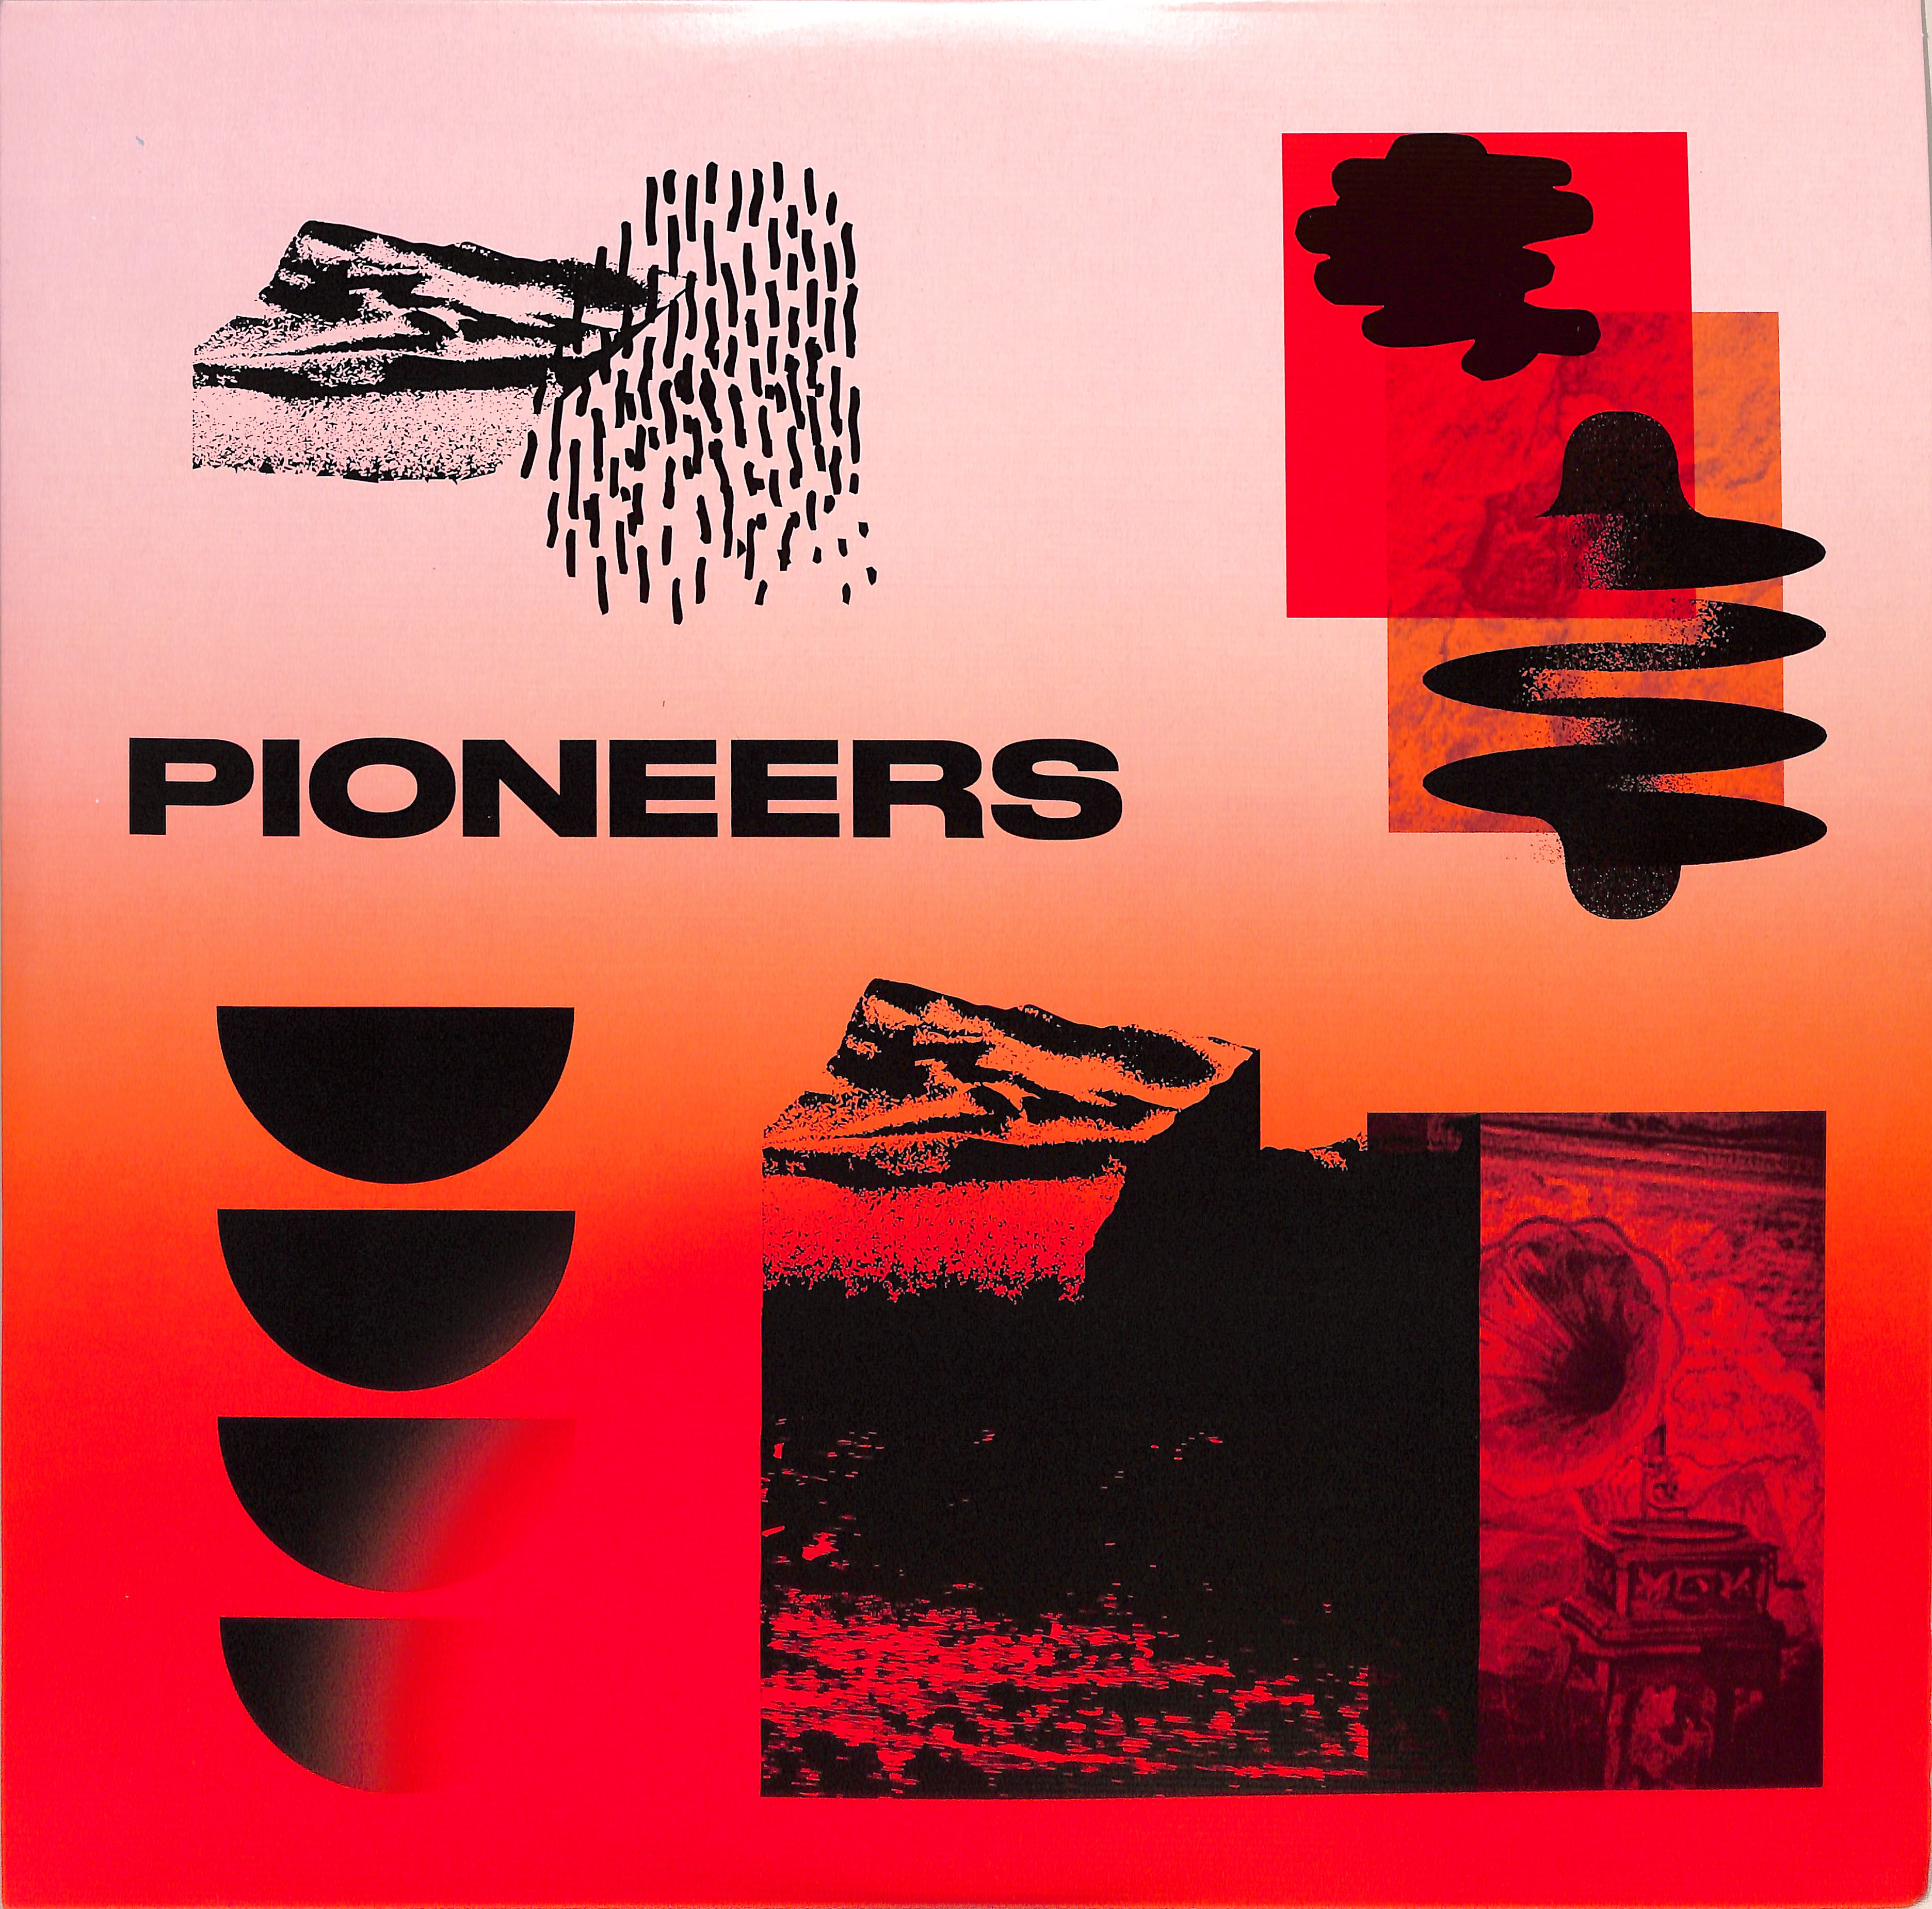 Johanna Knutsson, Tora Vinter, Fjader, Lioness - PIONEERS EP